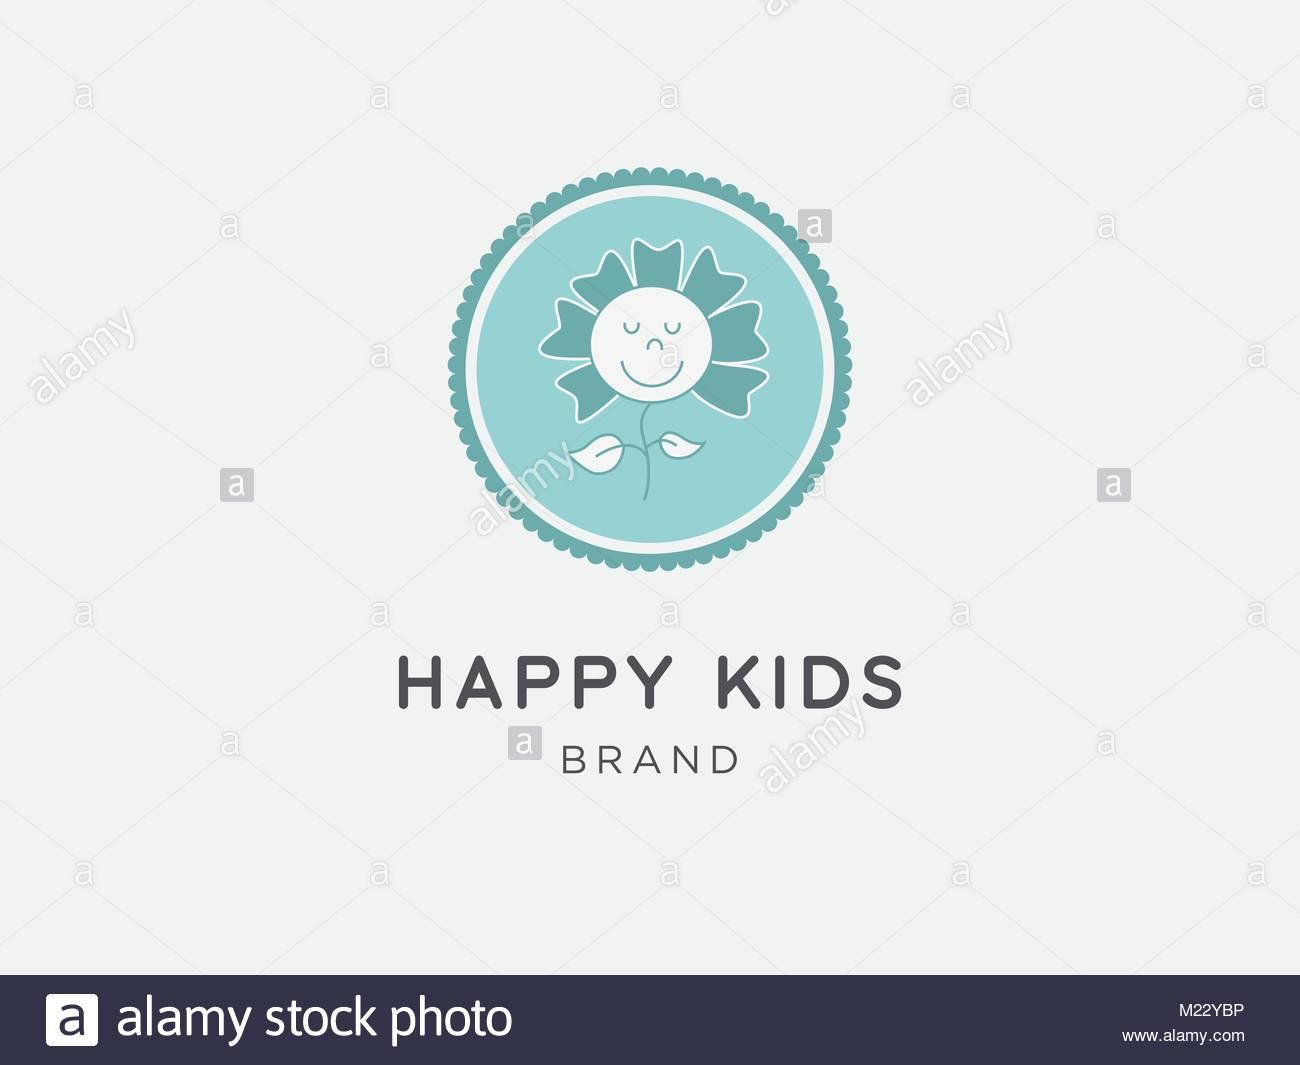 Cartoon flower illustration. Kids brand logo. - Stock Vector